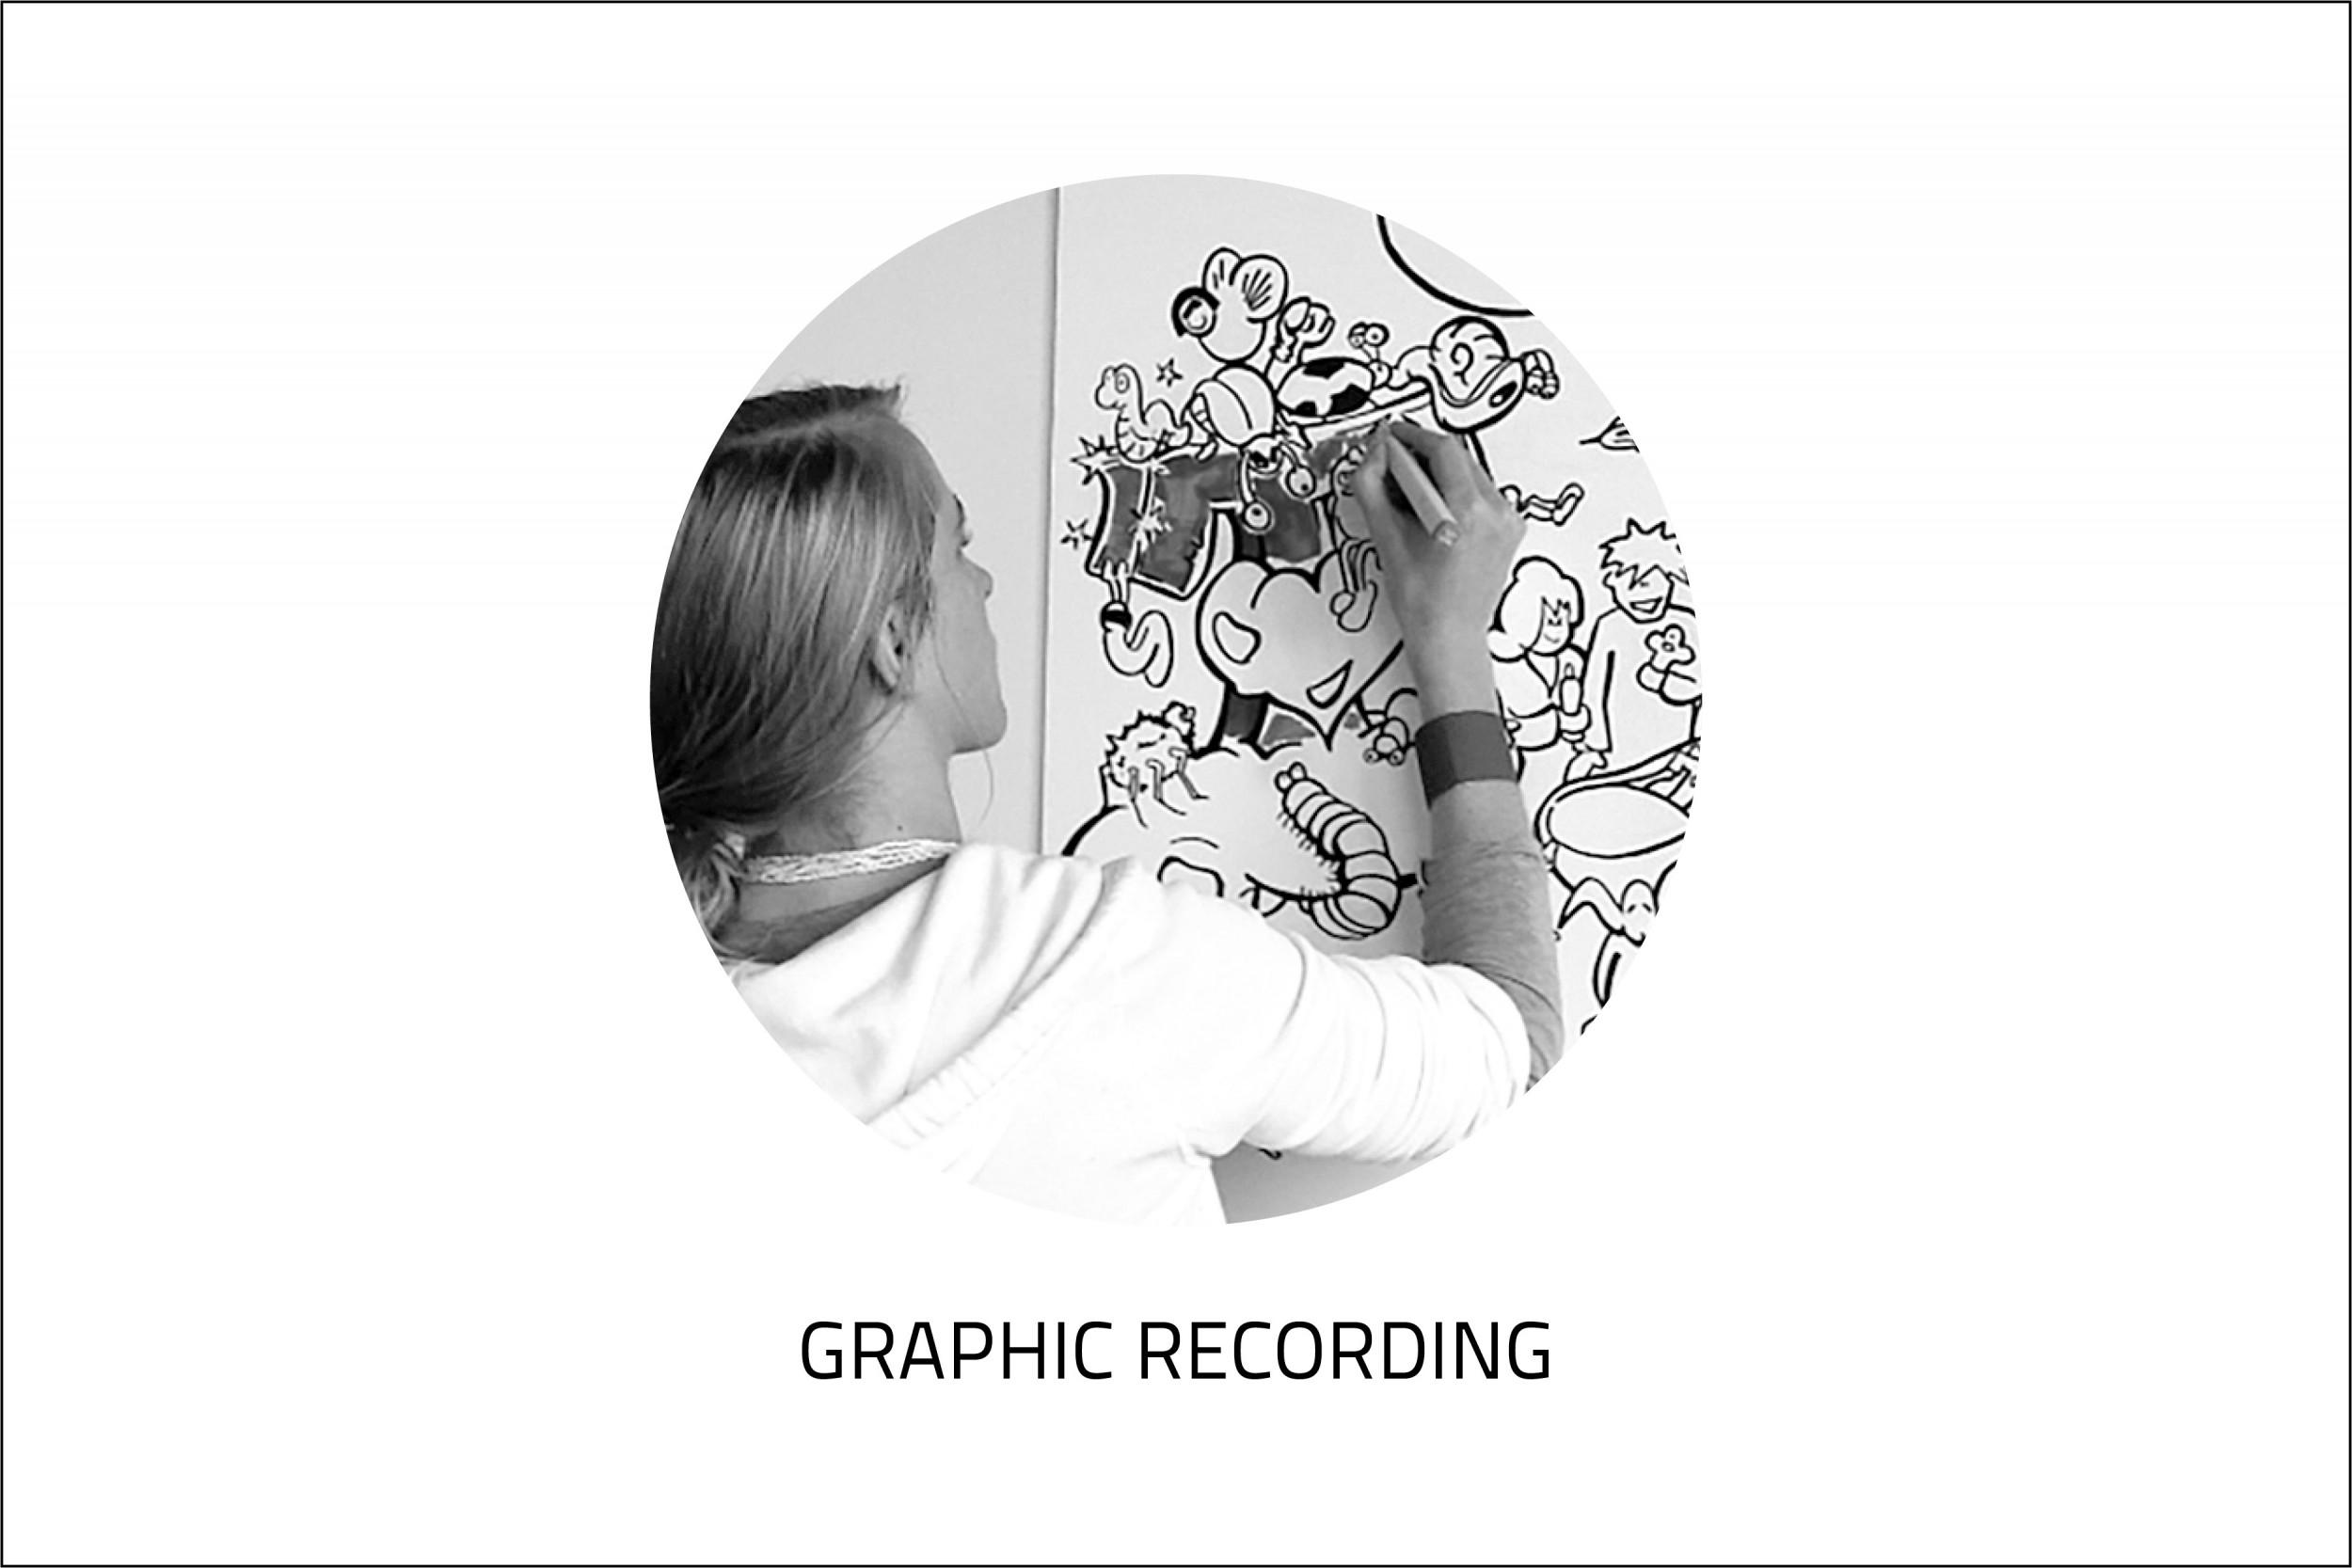 Julia Klaustermeyer - Graphic Recording Start Image